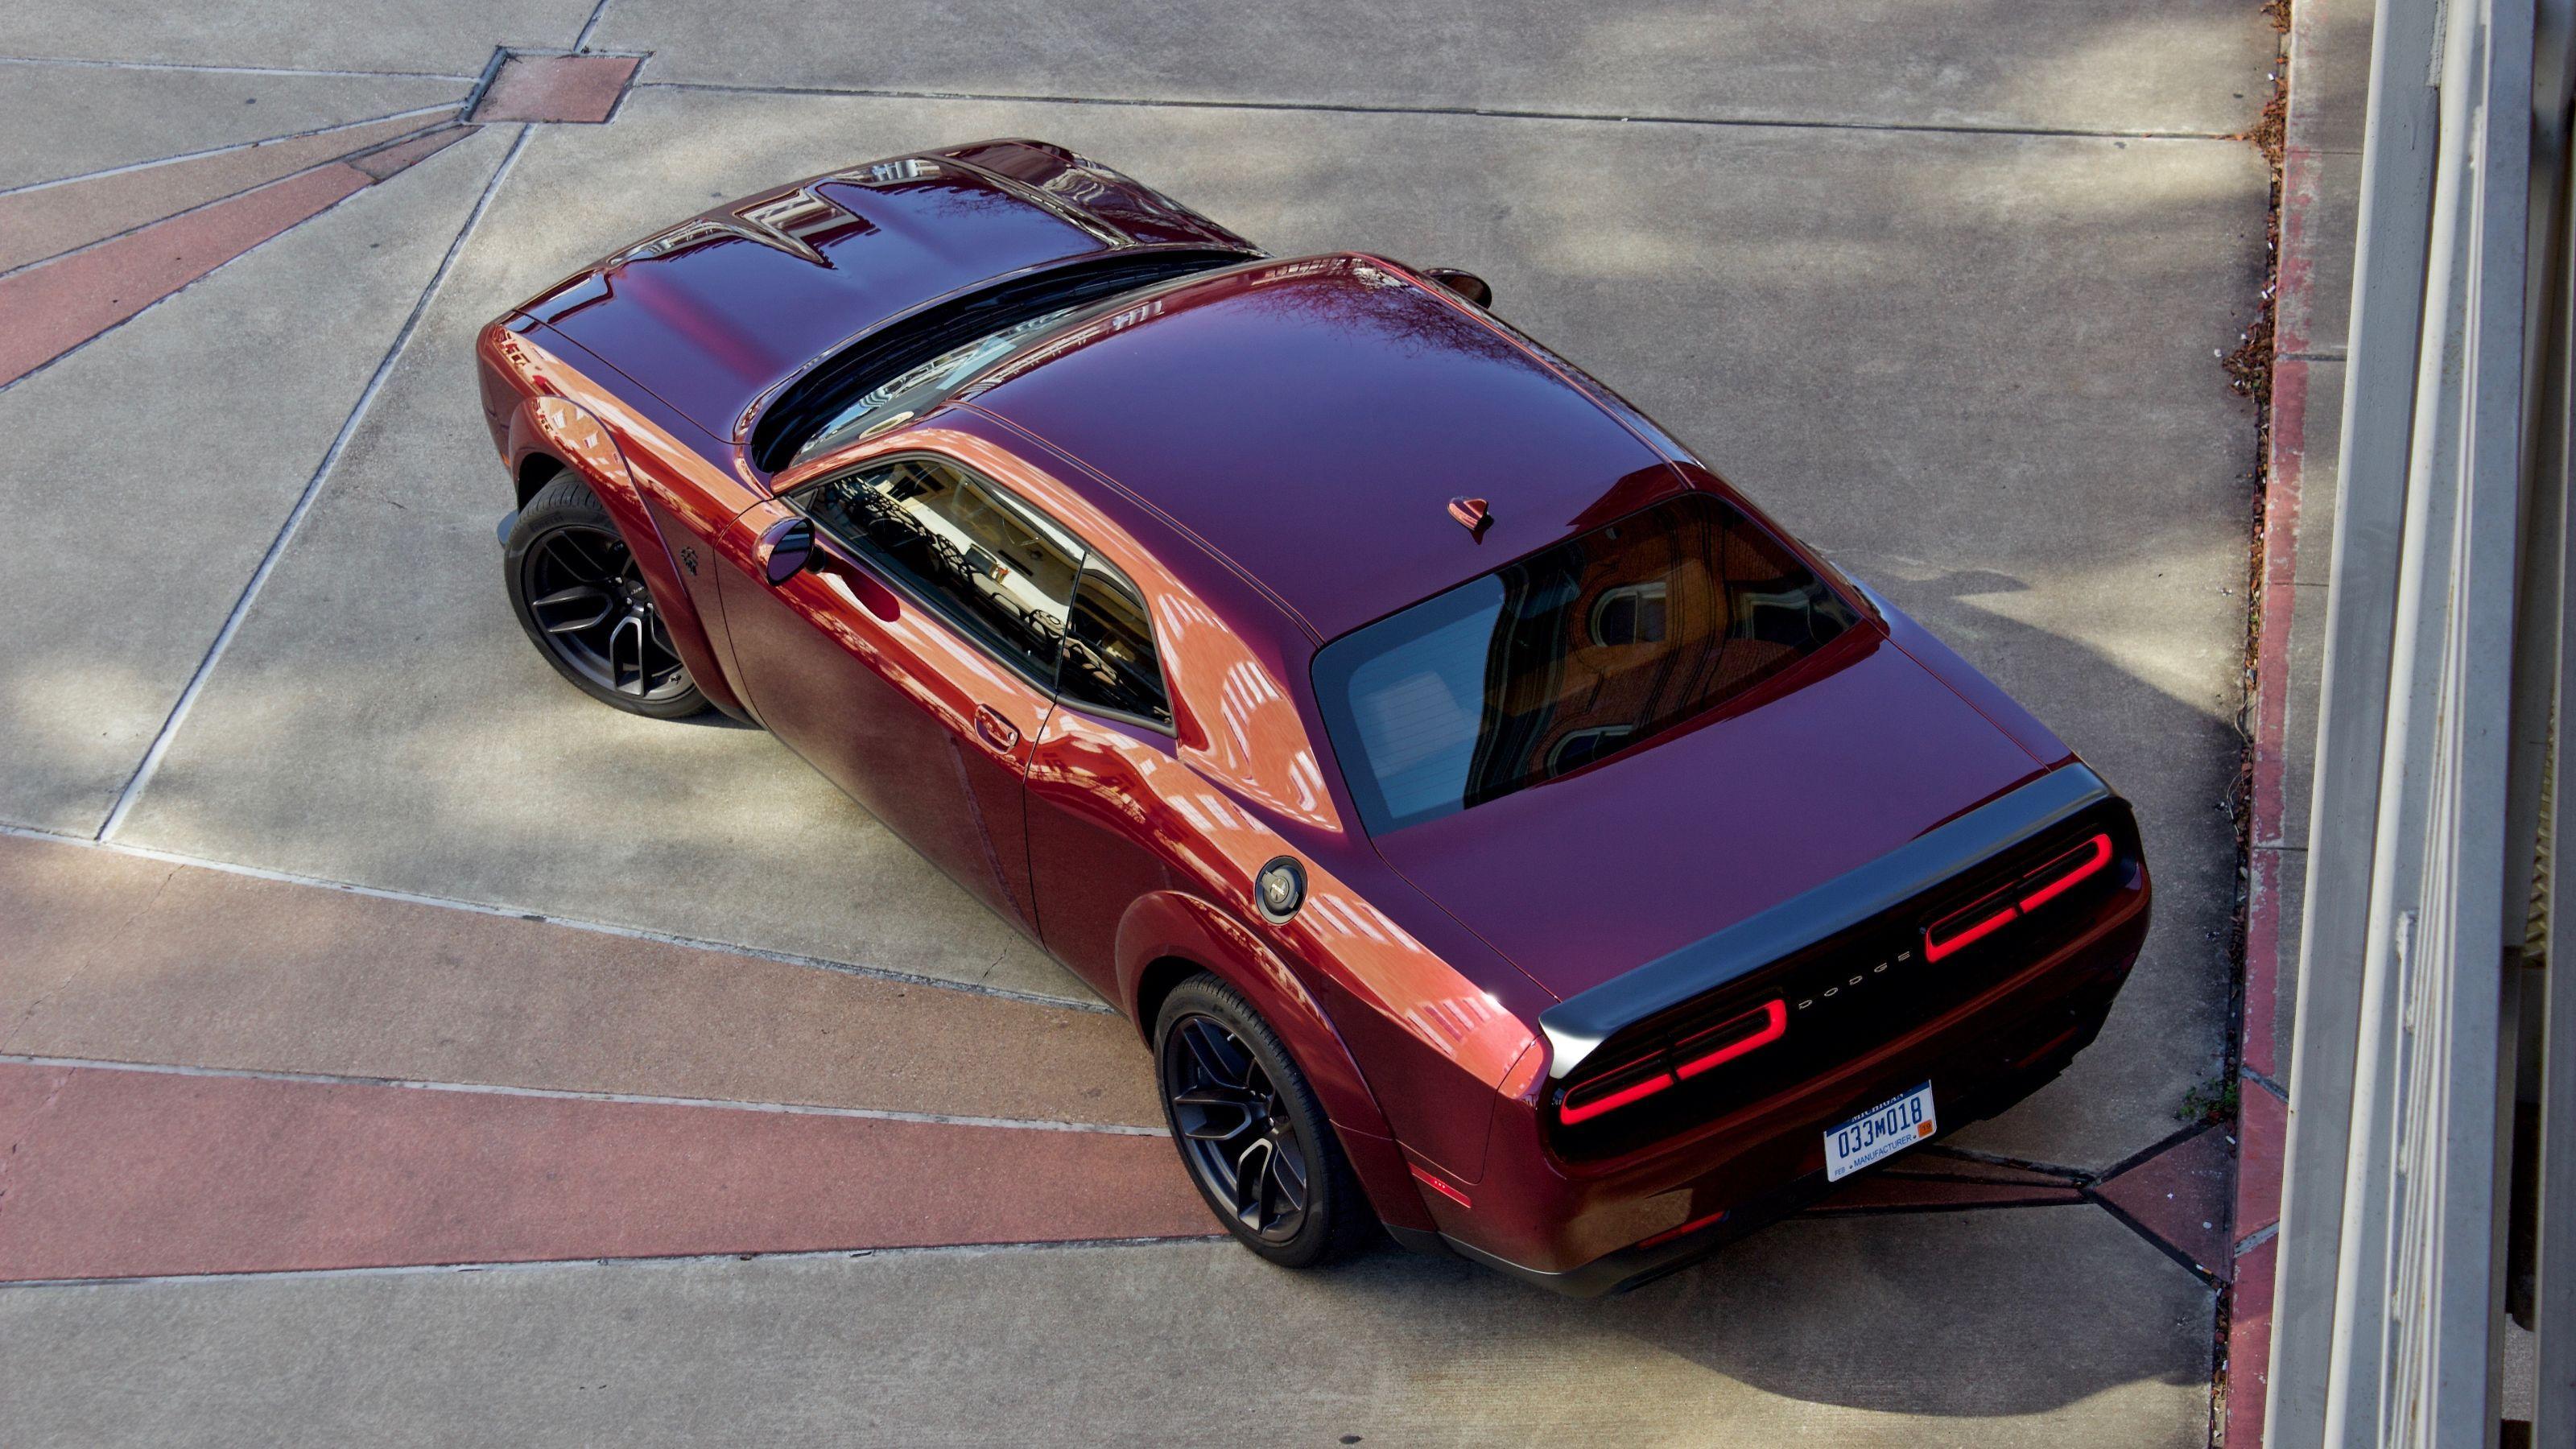 2019 Dodge Challenger Srt Hellcat Redeye In Octane Red Dodge Challenger Srt Hellcat Challenger Srt Hellcat Dodge Challenger Srt